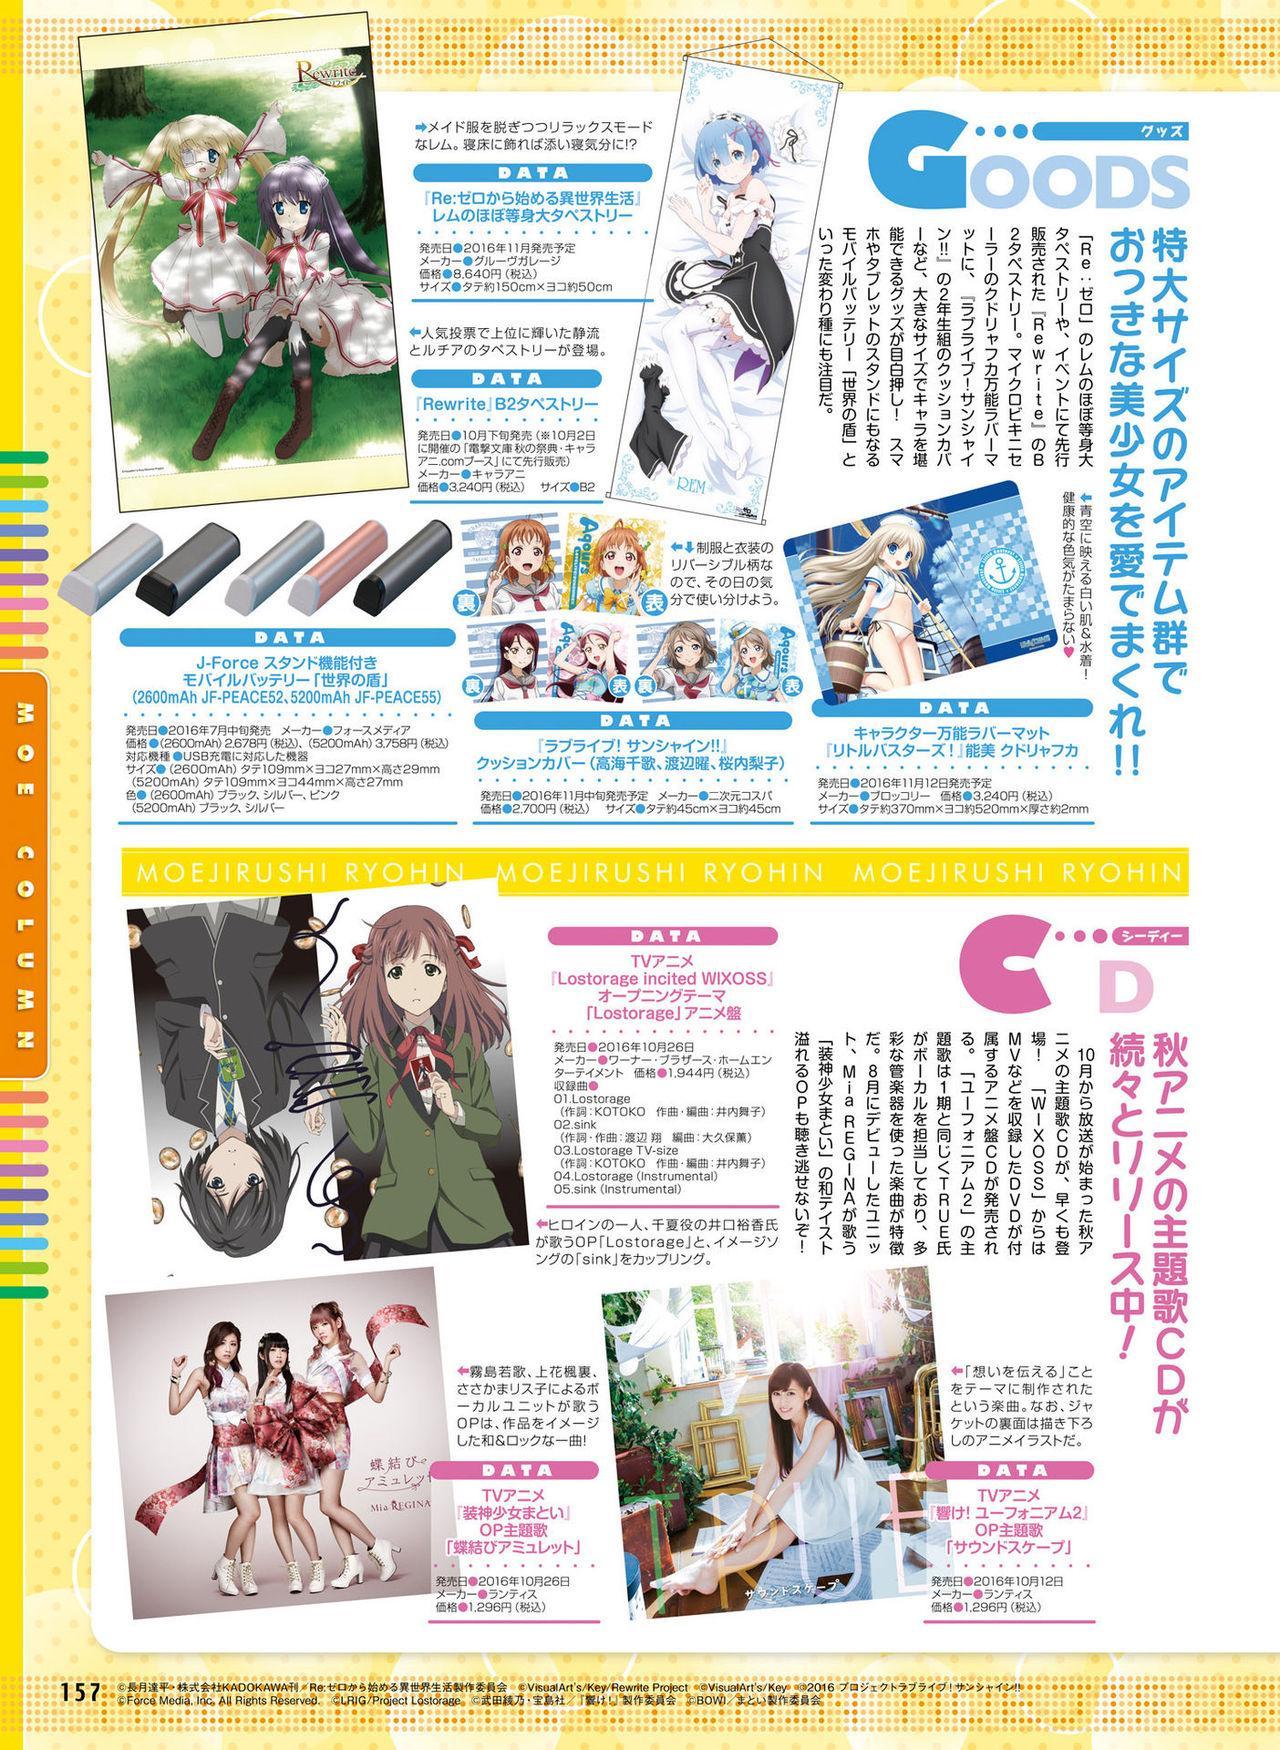 Dengeki Moeoh 2016-12 148